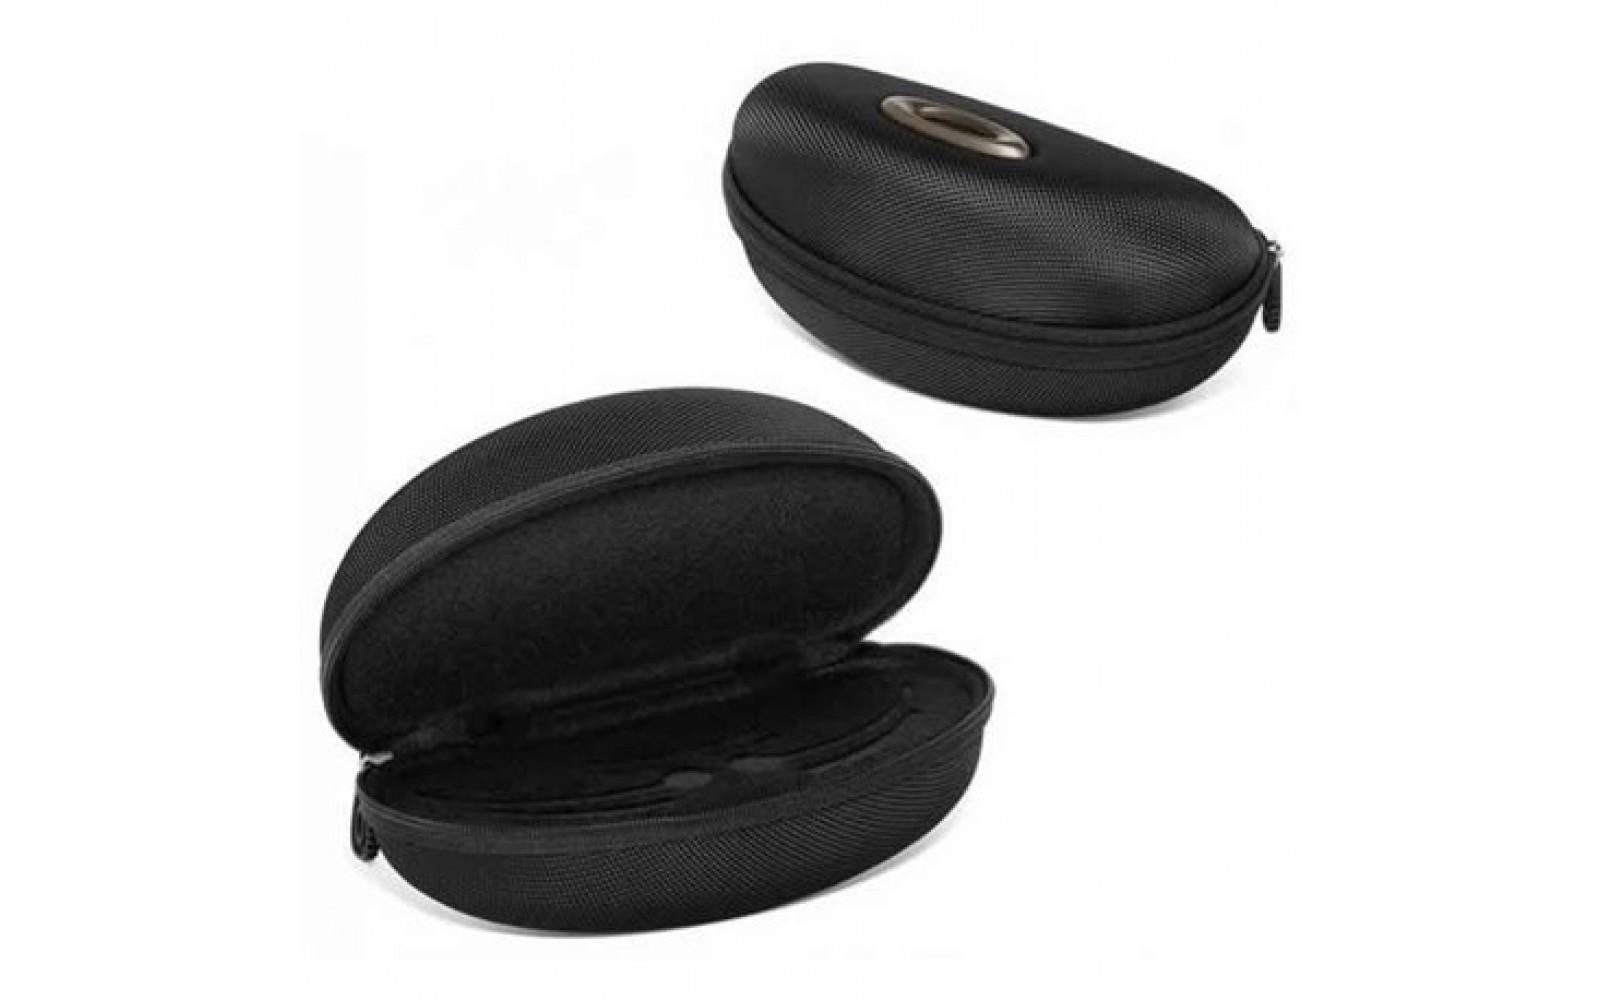 Oakley Racing Jacket Soft Vault - Black - Brillenkoker